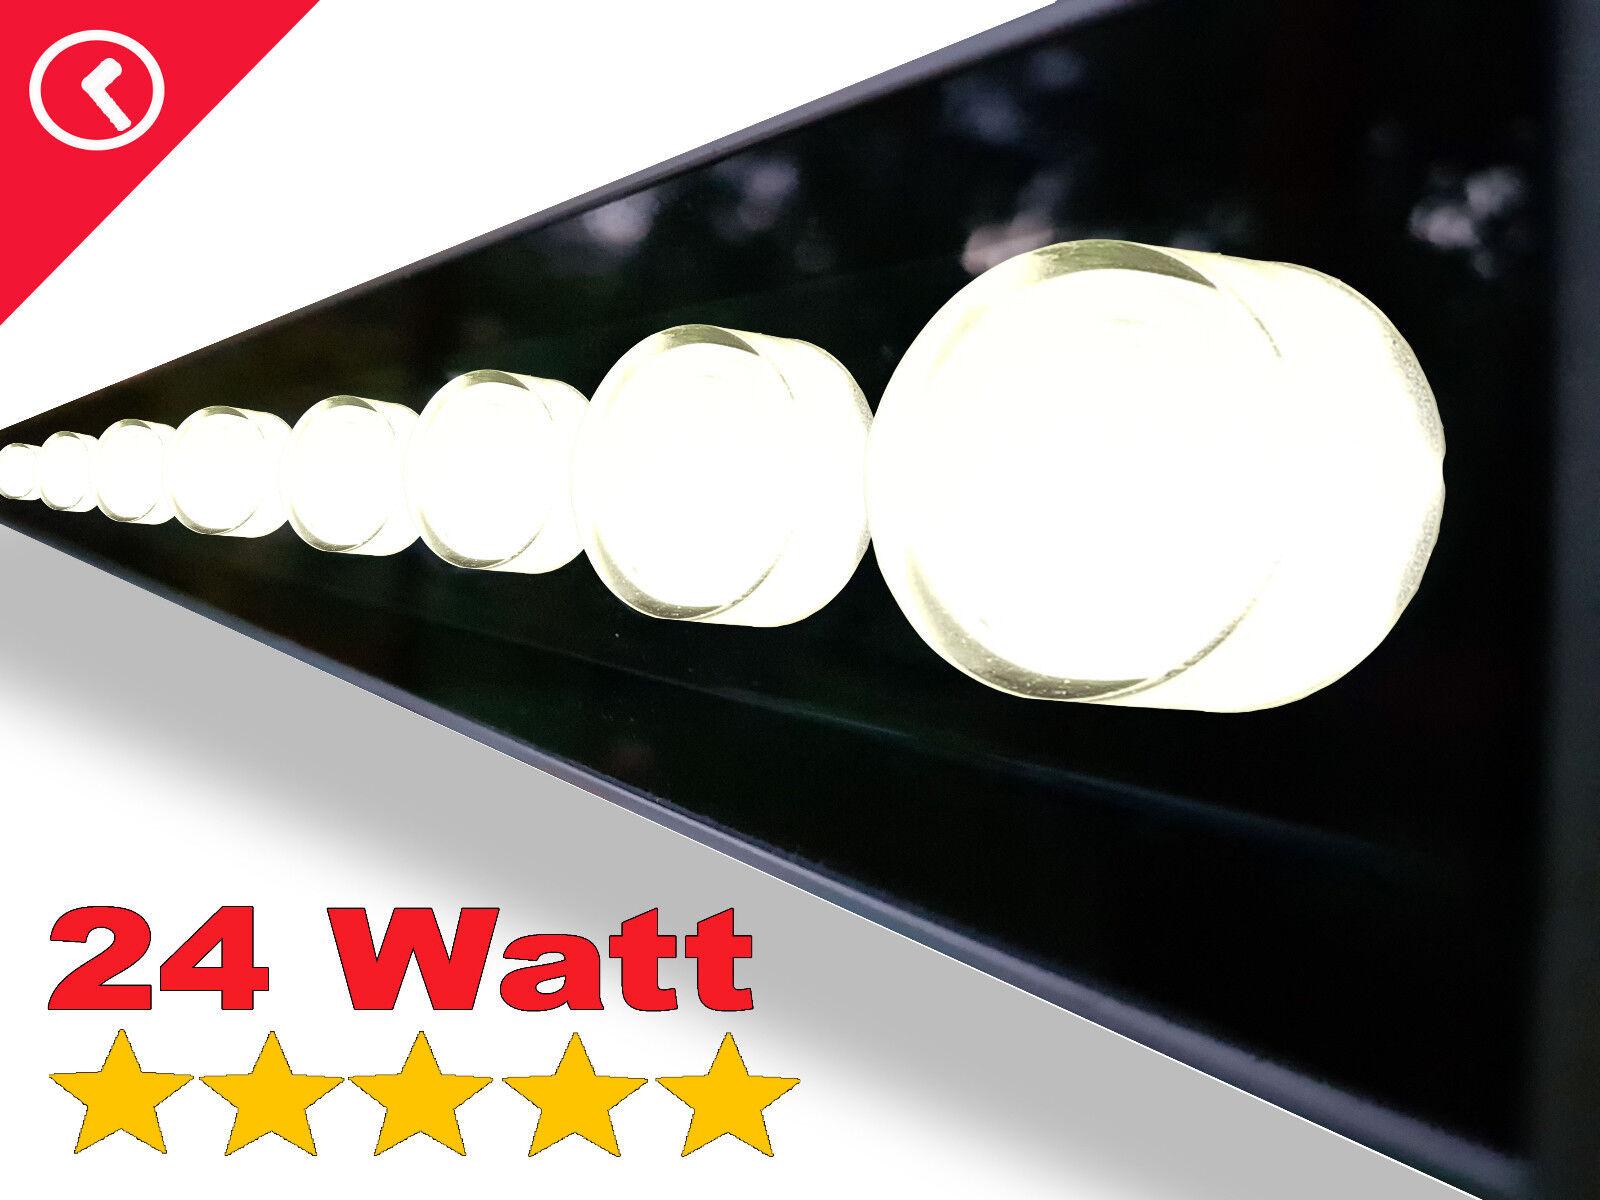 2x Led Strahler   Fassadenstrahler 230V- 24 Watt  3500K  warmweiß   | Lebendige Form  | Mode-Muster  | Elegant Und Würdevoll